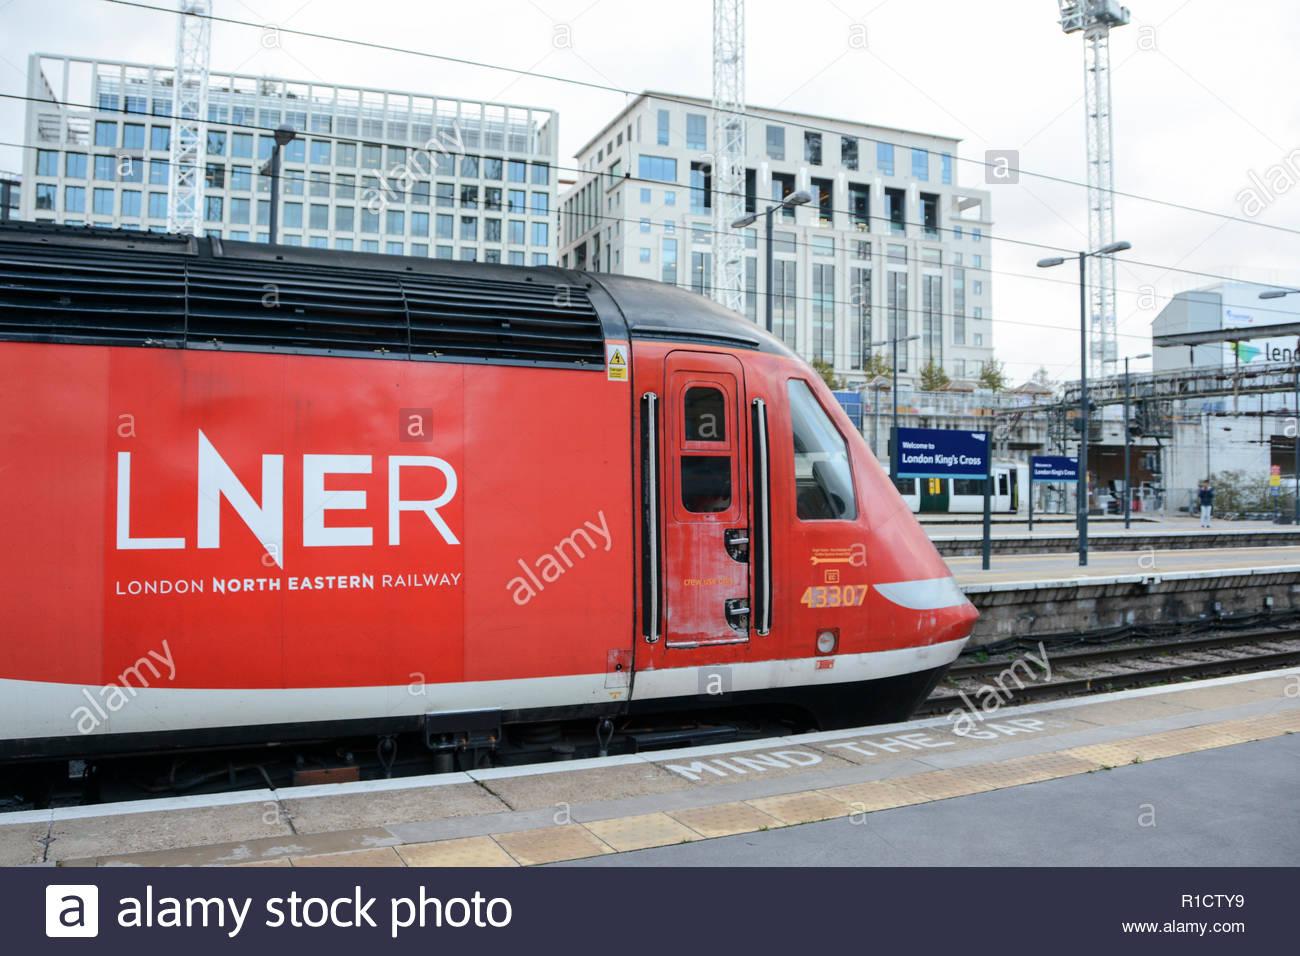 London North Eastern Railway (LNER), KIngs Cross station, London, UK - Stock Image